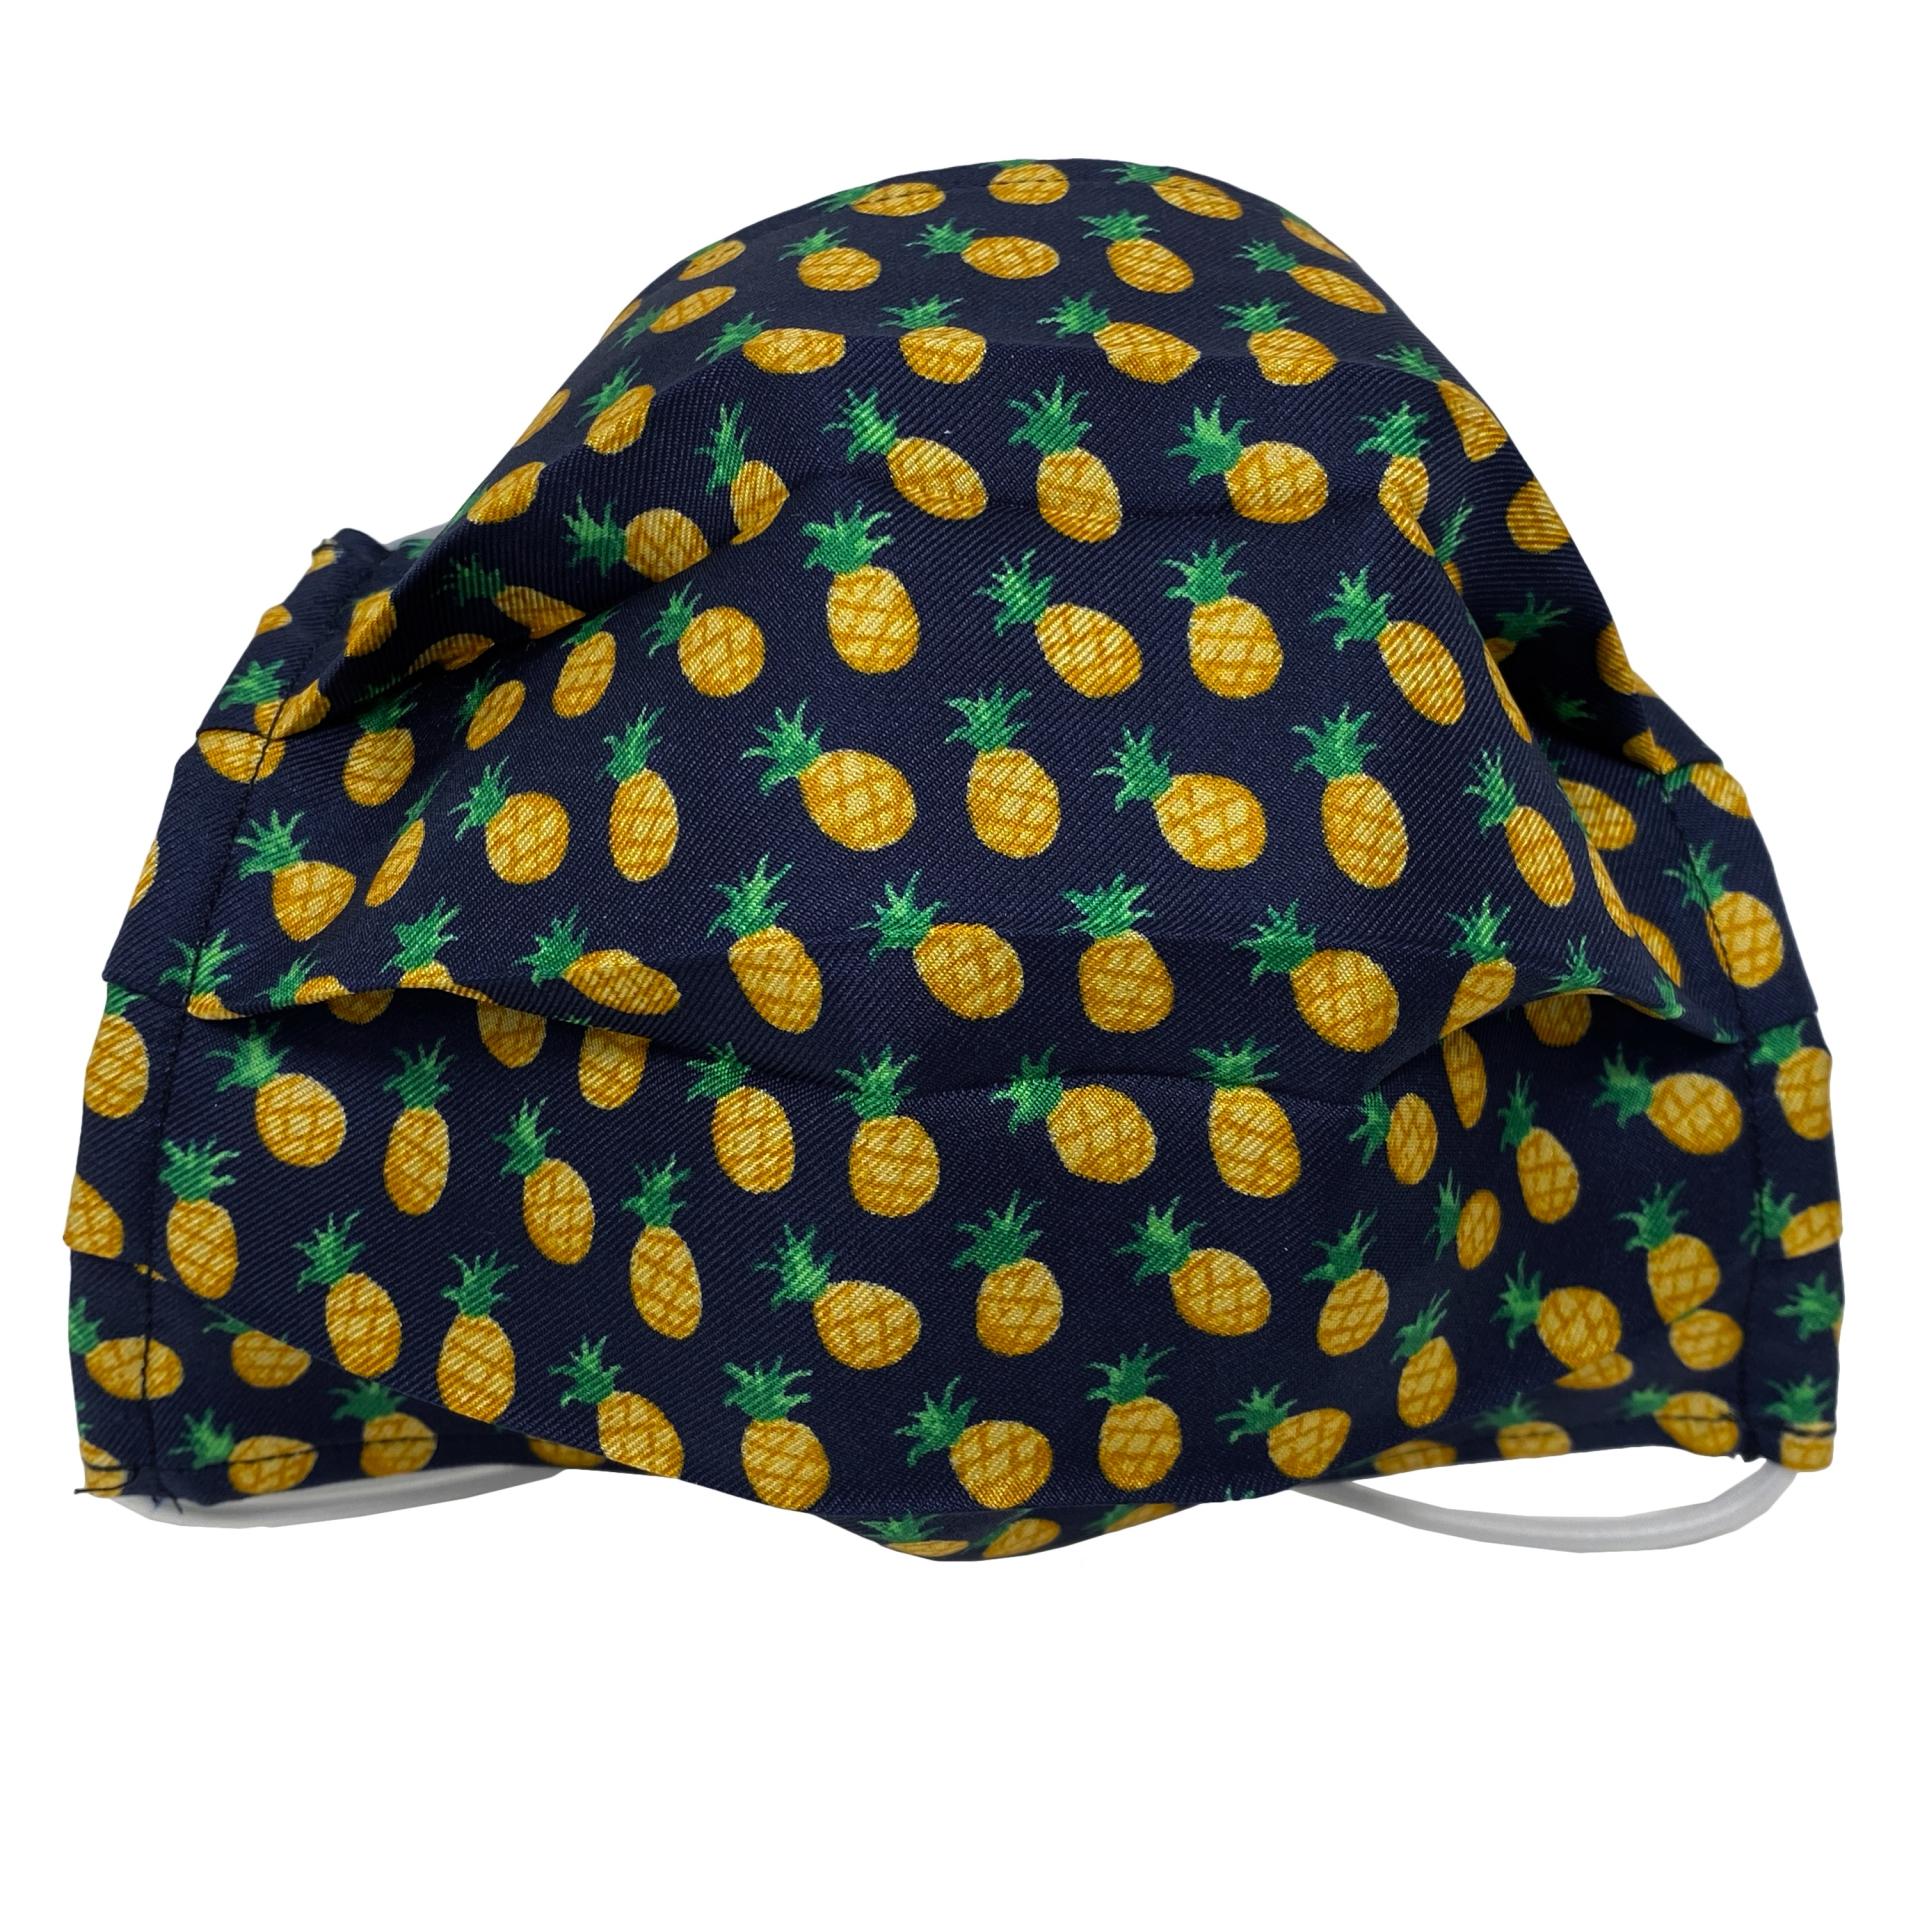 StyleMask Mascherina facciale bambino filtrante blu fantasia ananas, in seta